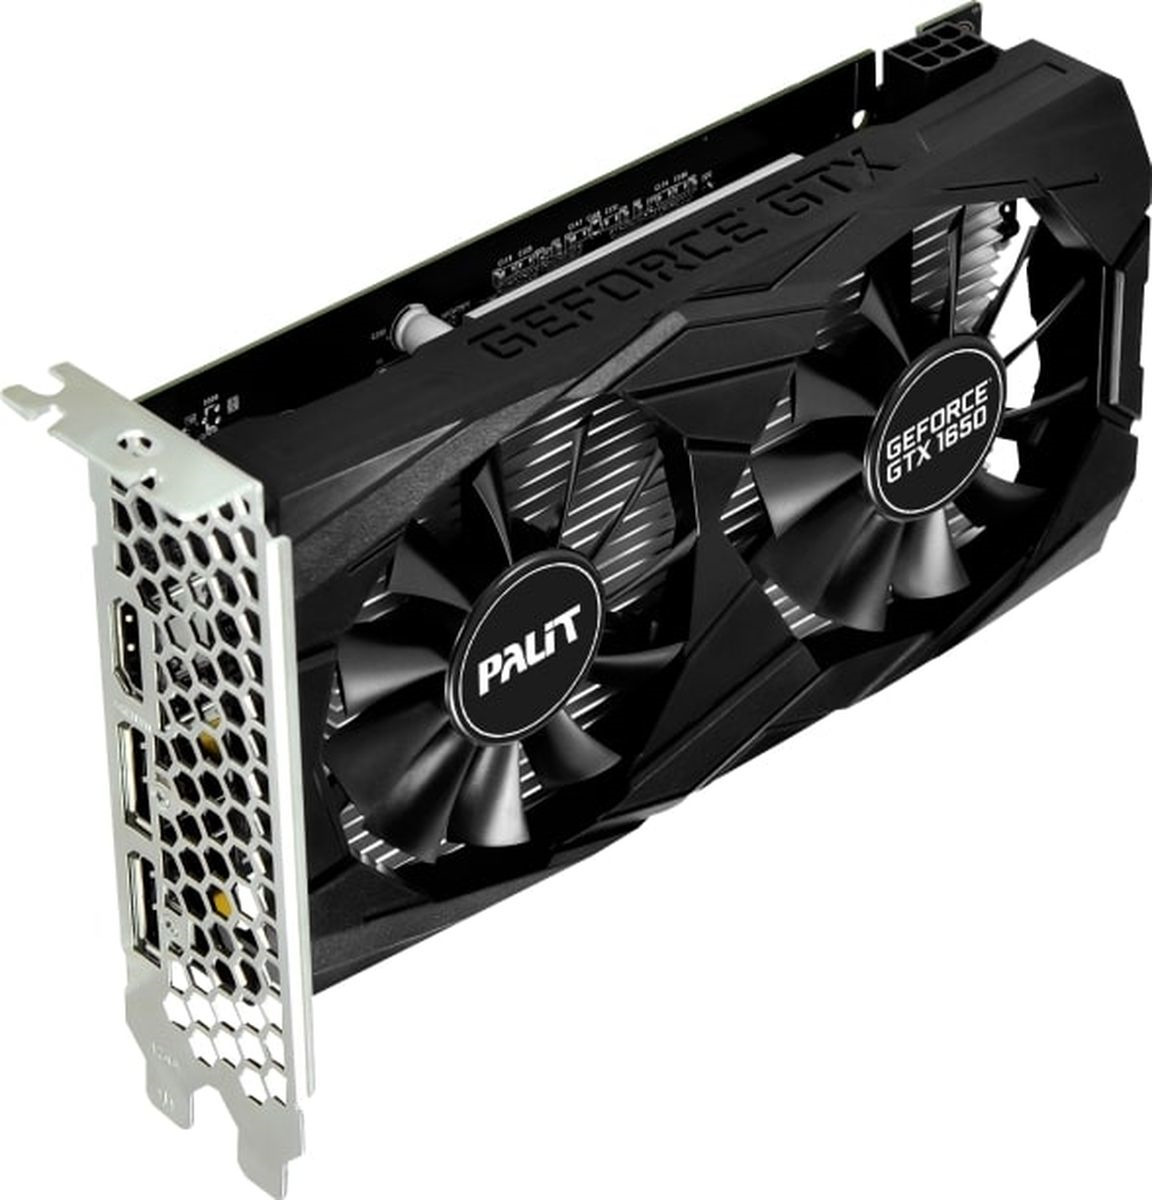 Видеокарта Palit GeForce GTX 1650 Dual 4GB, NE5165001BG1-1171D видеокарта palit pa gtx1060 dual 3g